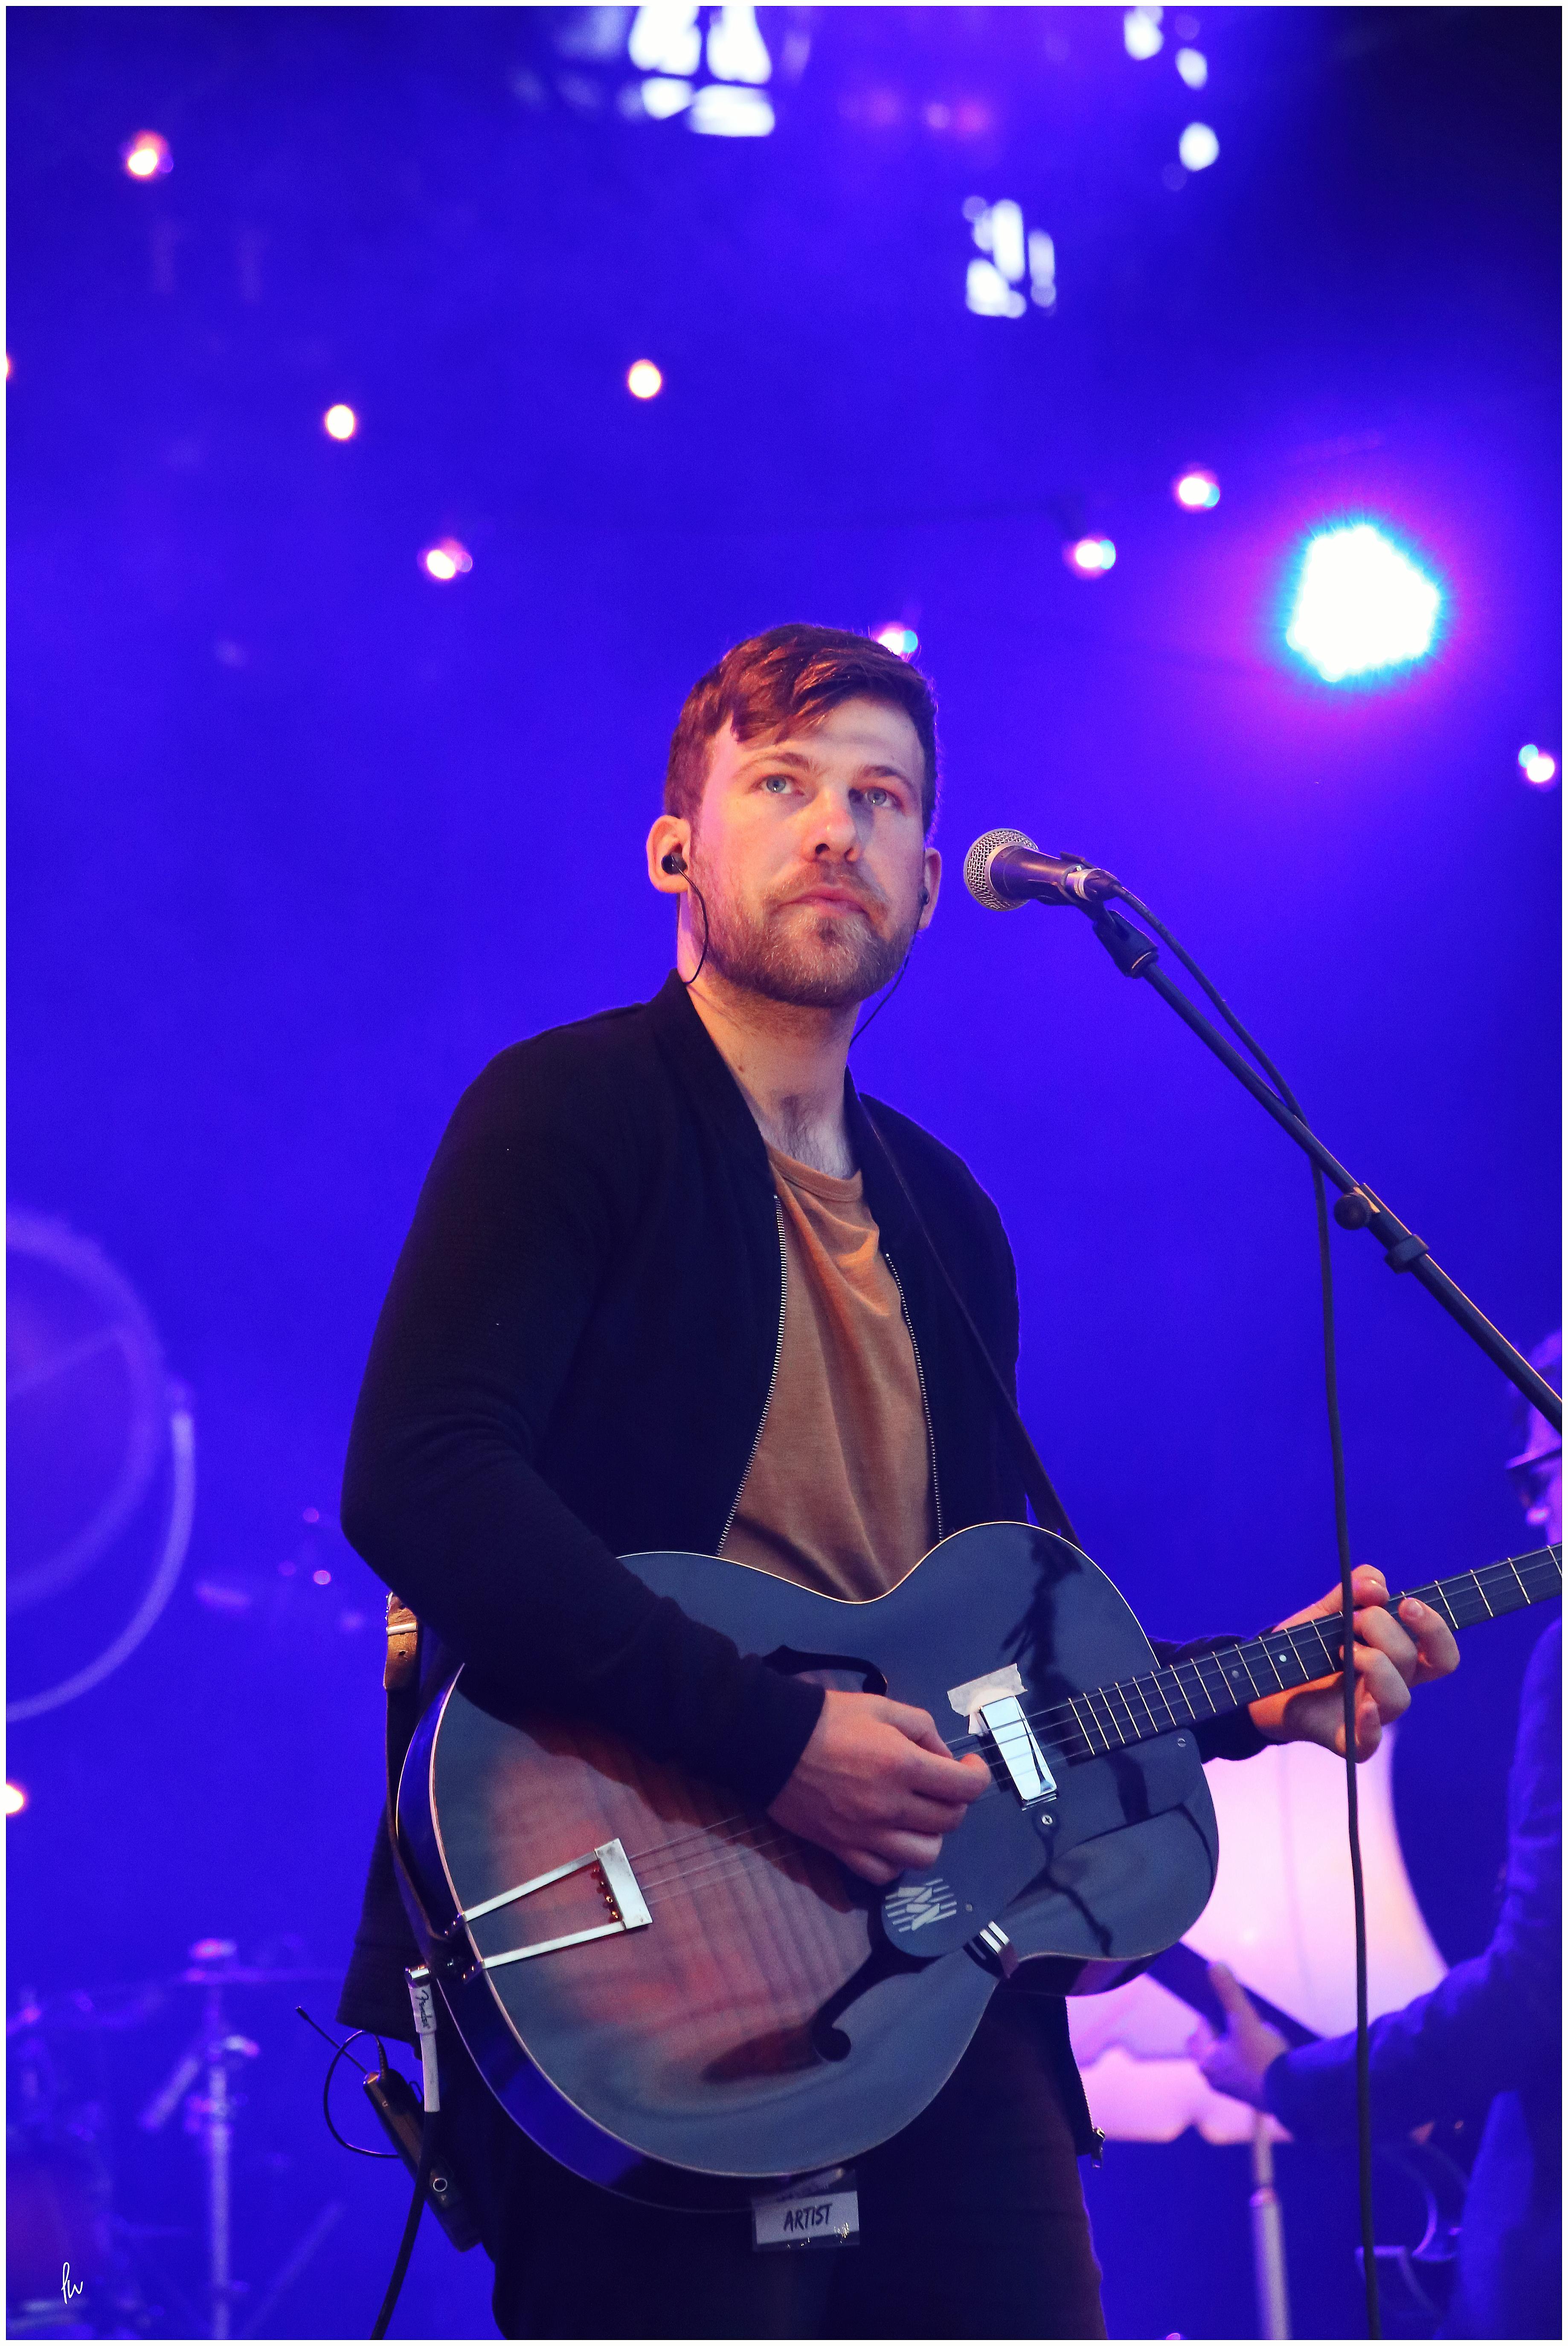 photograph of guitar player